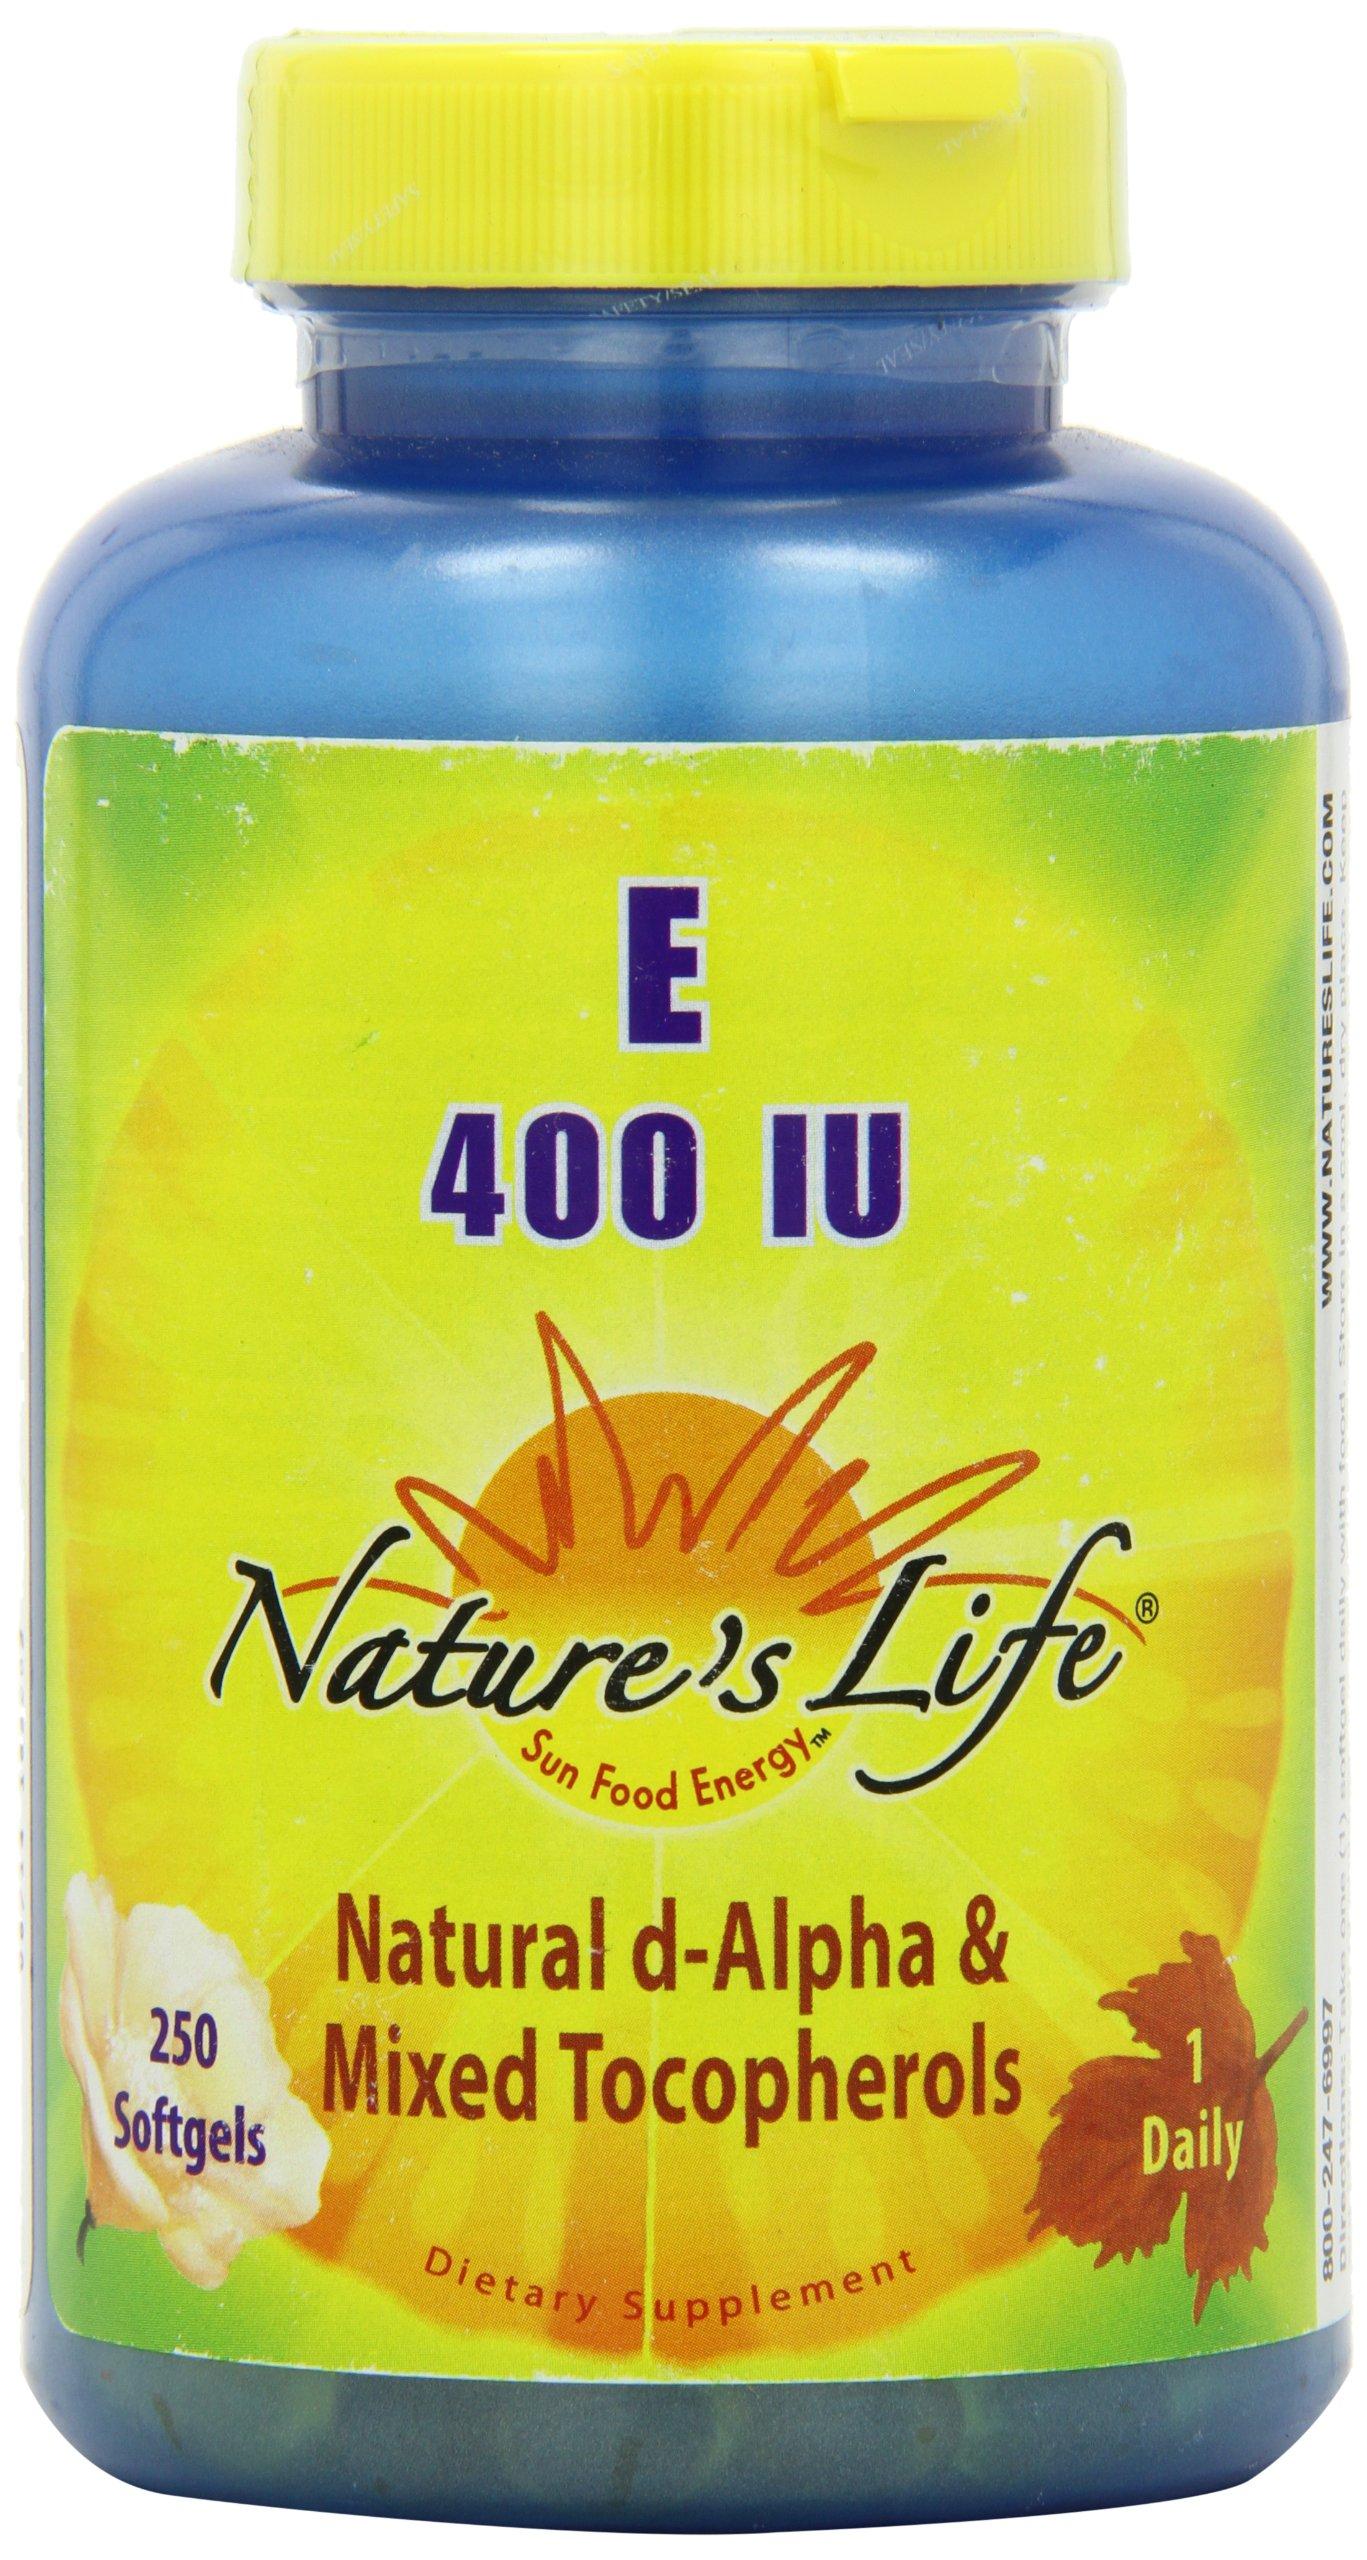 Nature's Life E, D-Alpha and Mixed Tocopherols 400 IU Softgels, 250 Count by Nature's Life